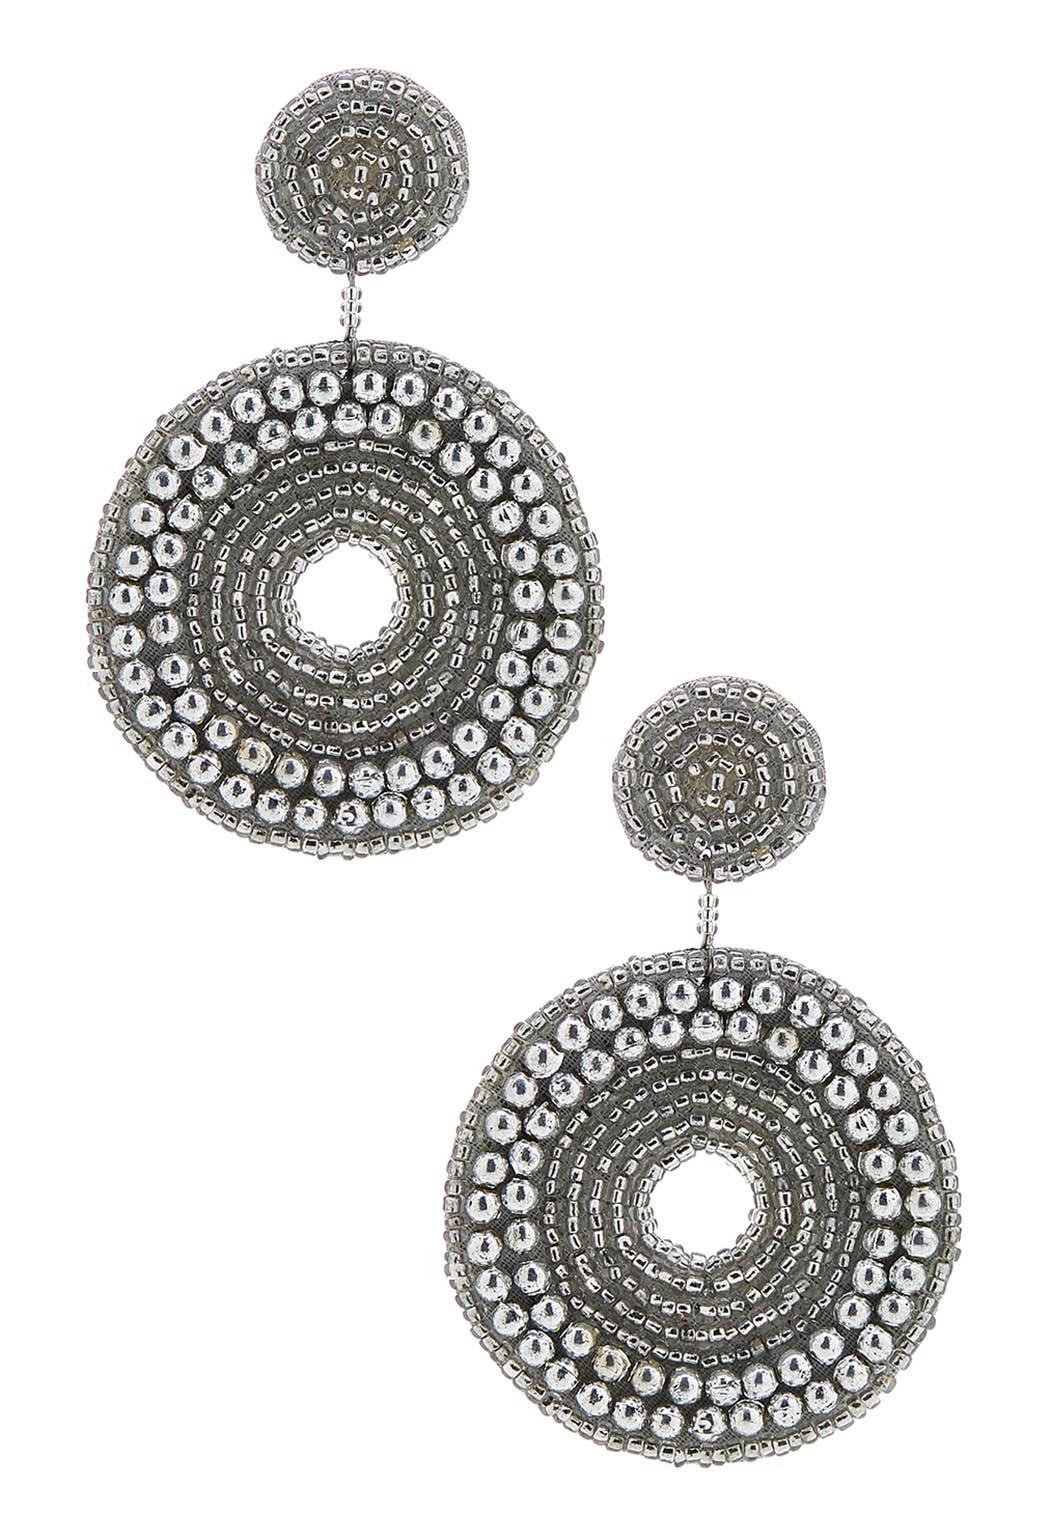 Statement Seed Bead Earrings